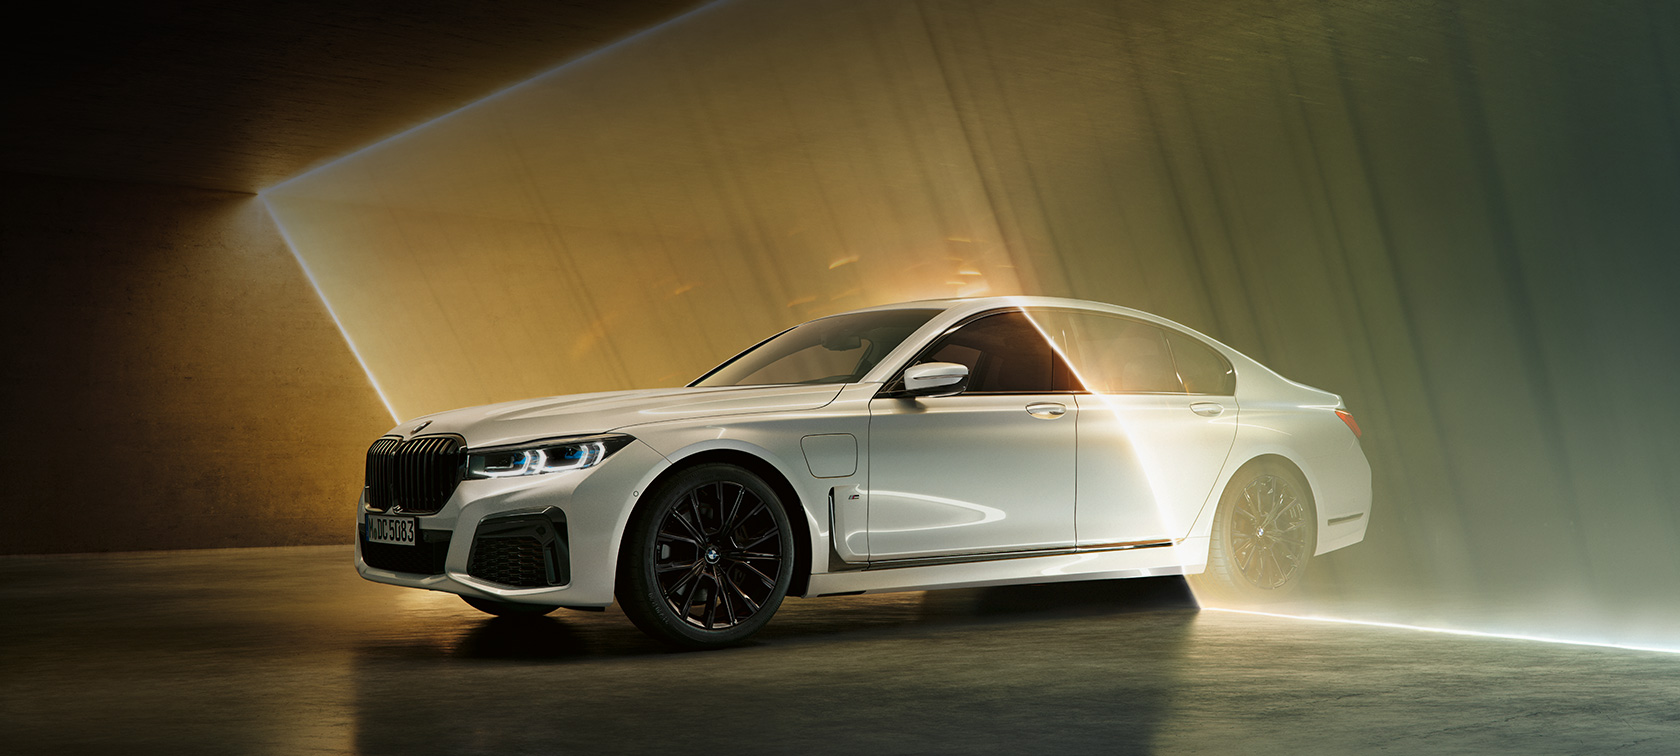 Bmw 7 Series The Sedan Of The Luxury Class Bmw Com Au